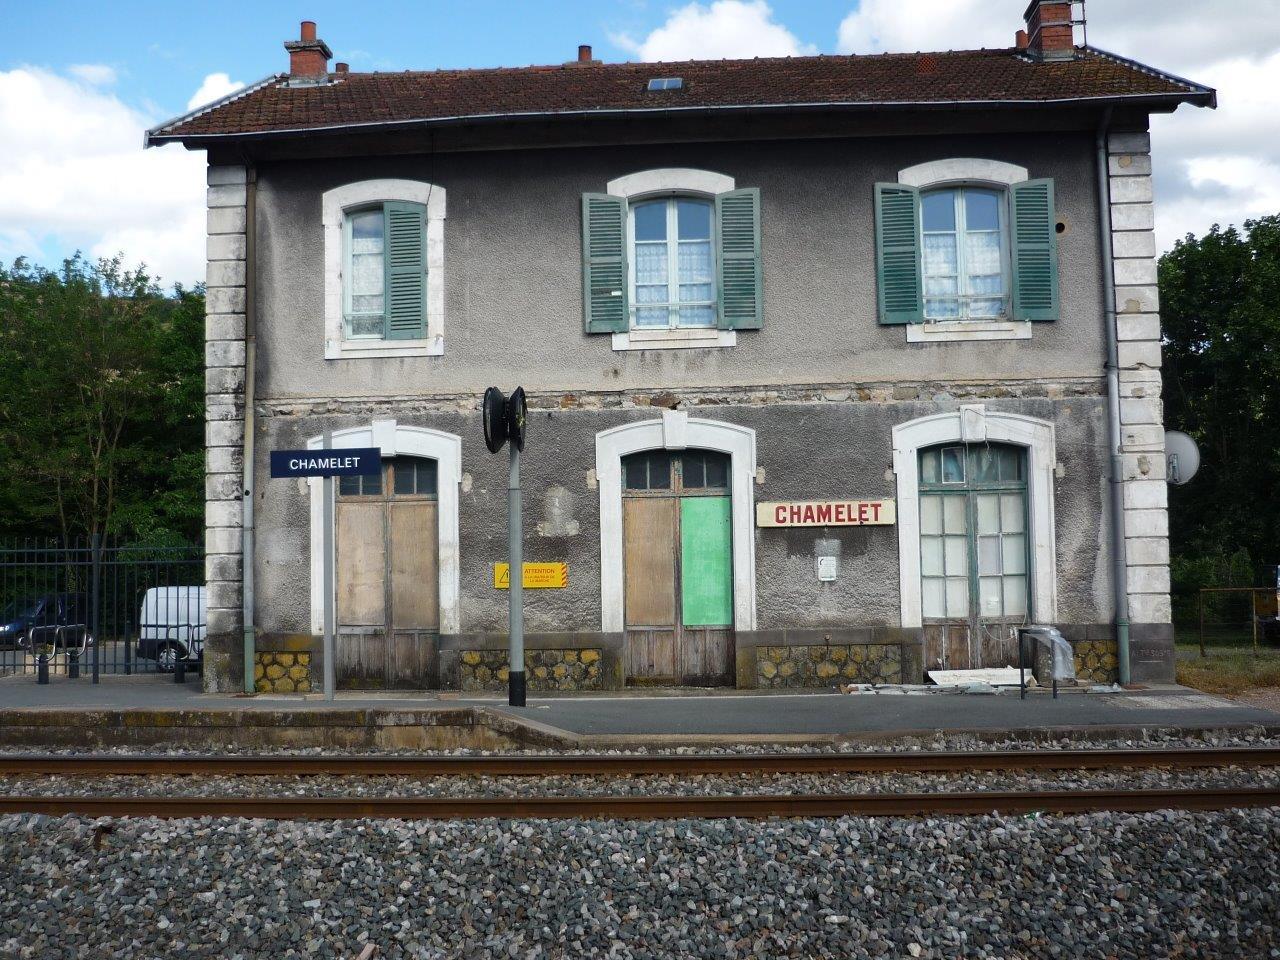 gare-de-chamelet-train-station